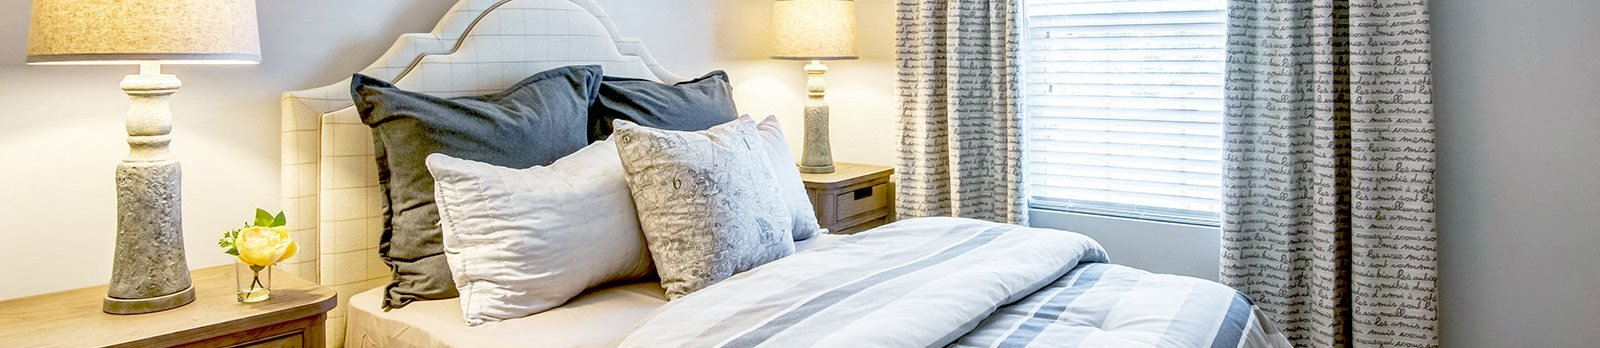 Modern Furnishings at Hidden Creek Village Apartments, Fayetteville